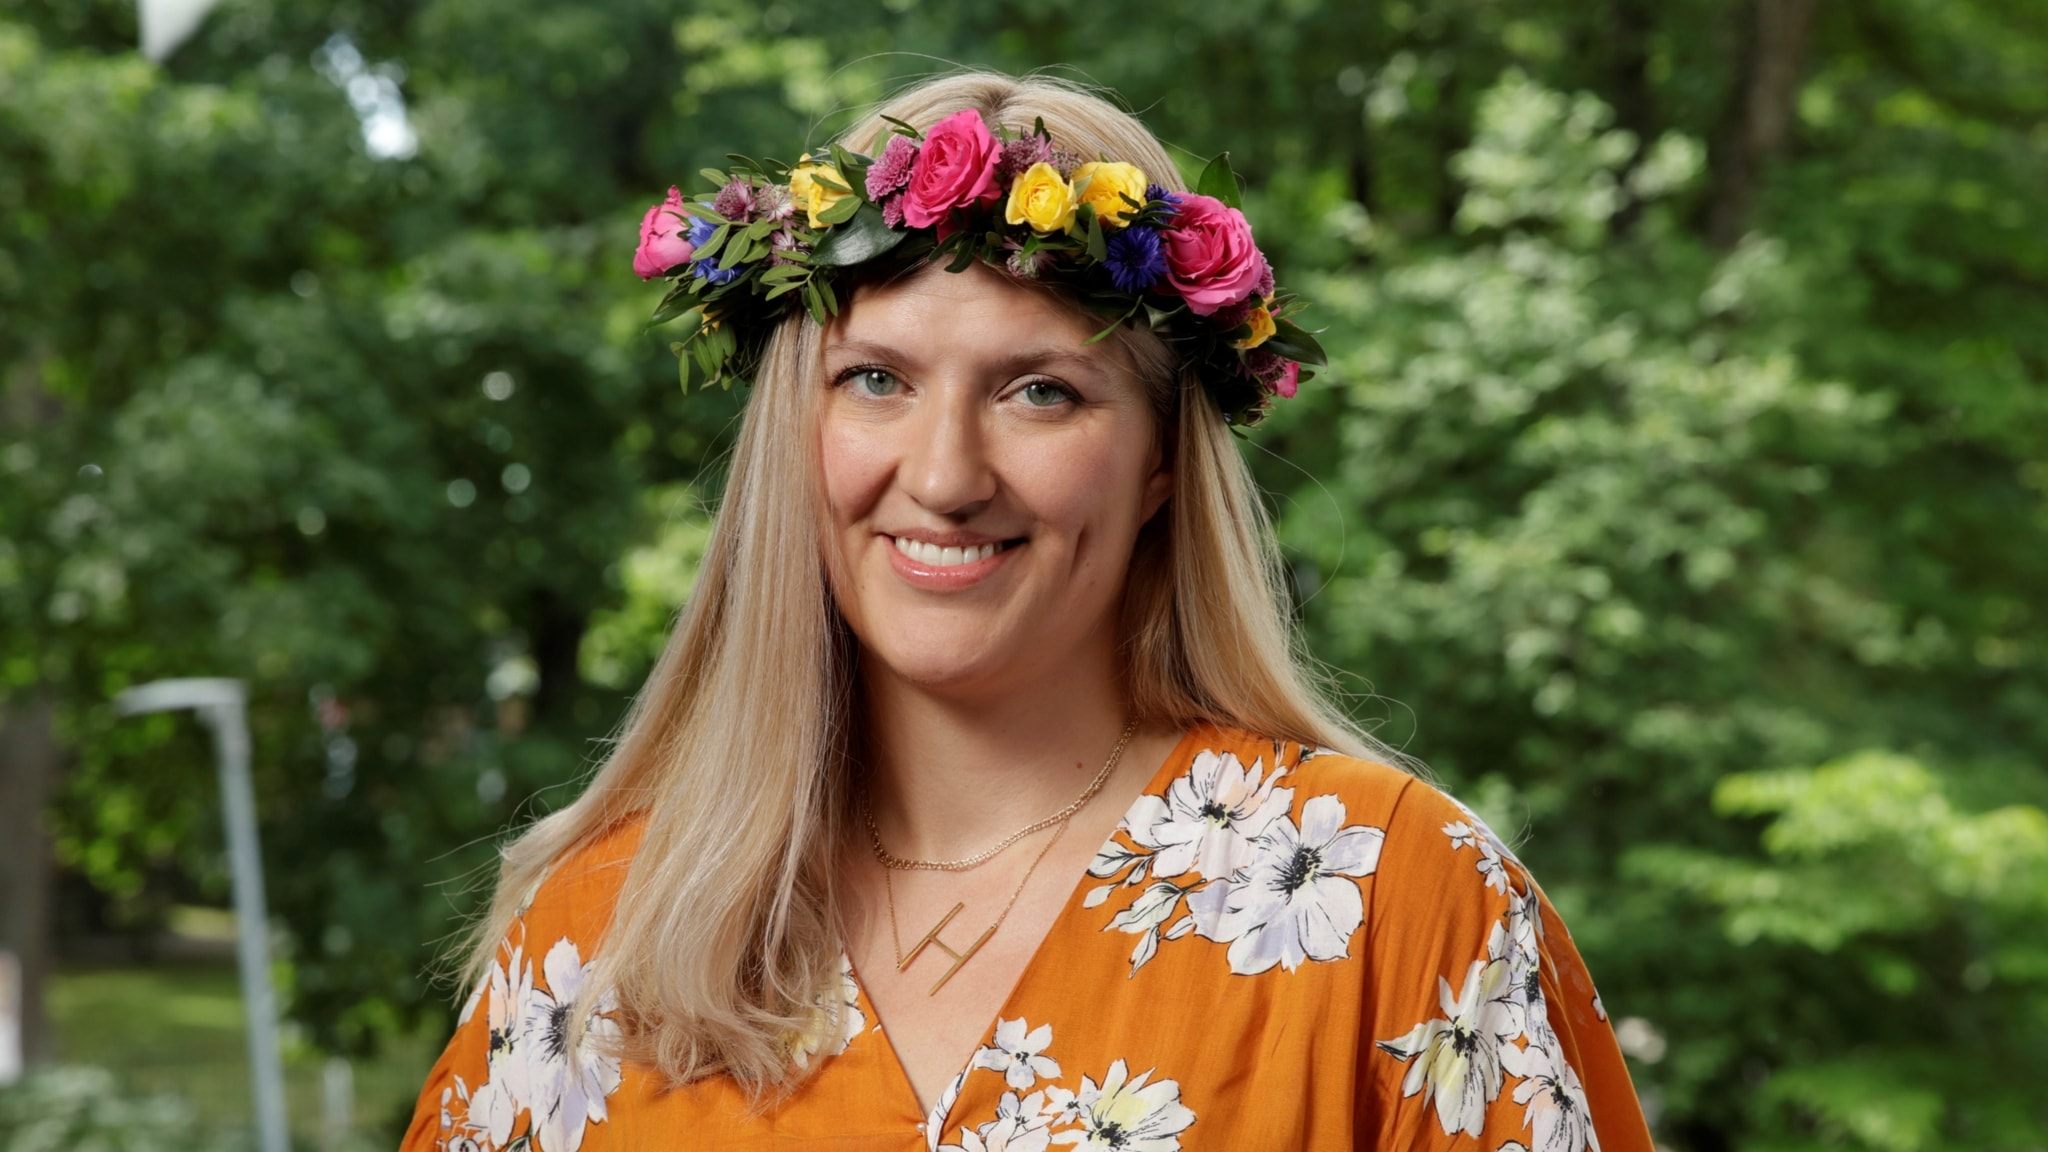 Beatrice Fihn